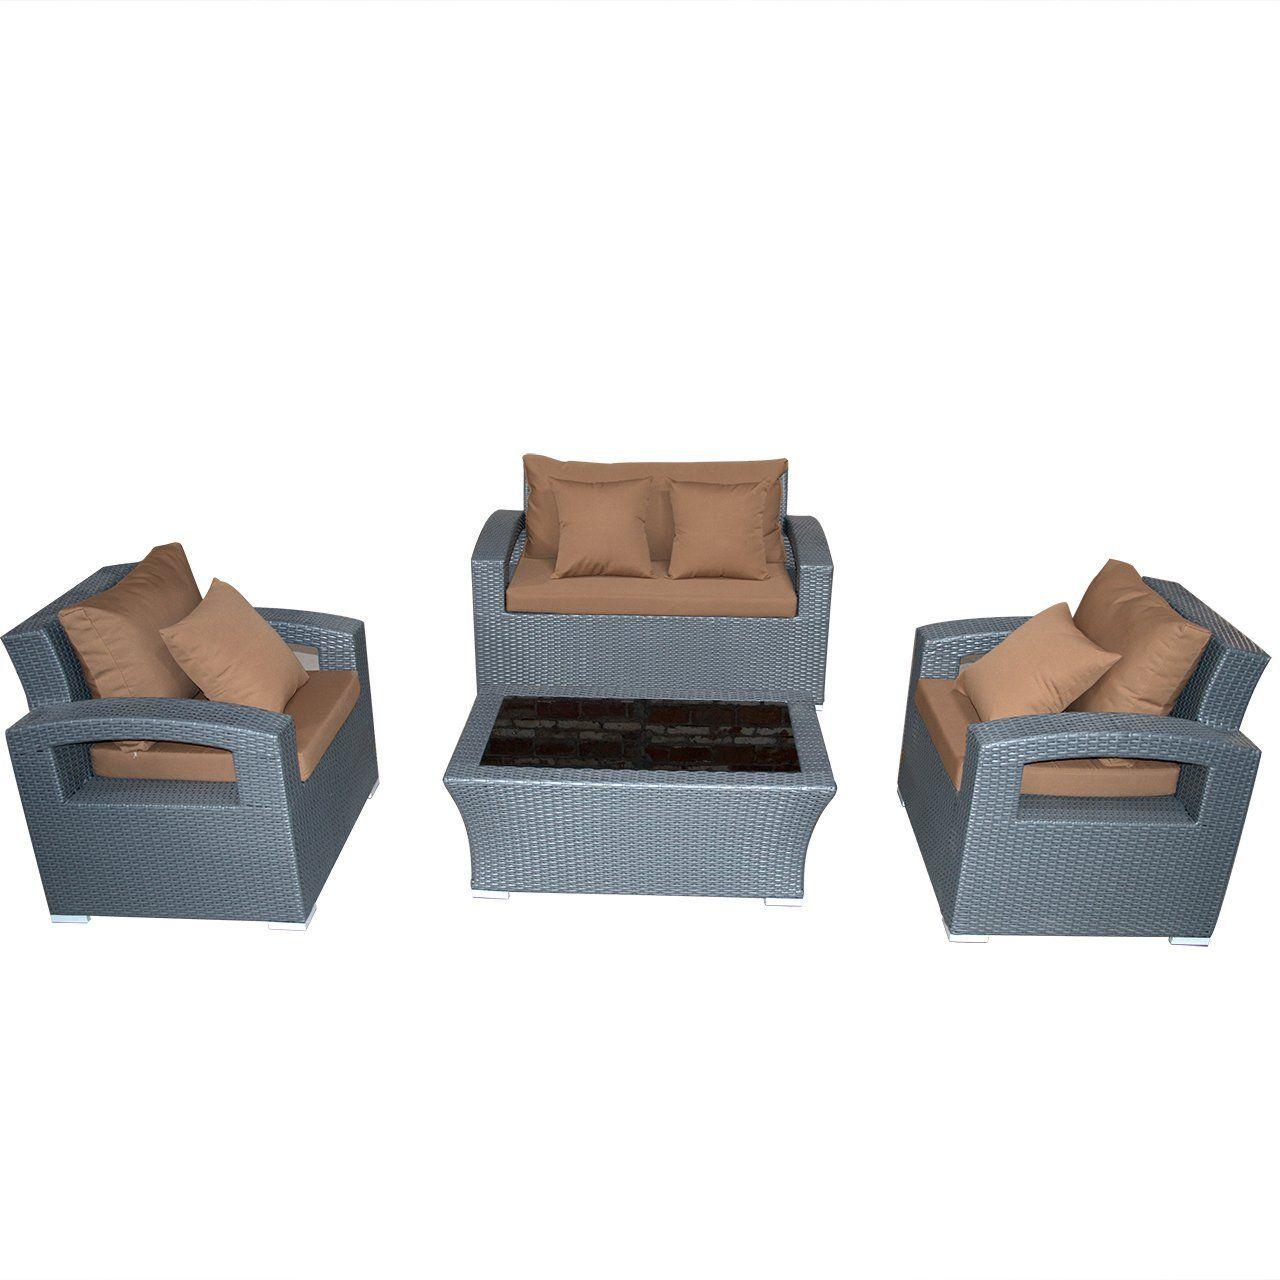 Mayshion outdoor backyard piece resin rattan wicker sofa sectional